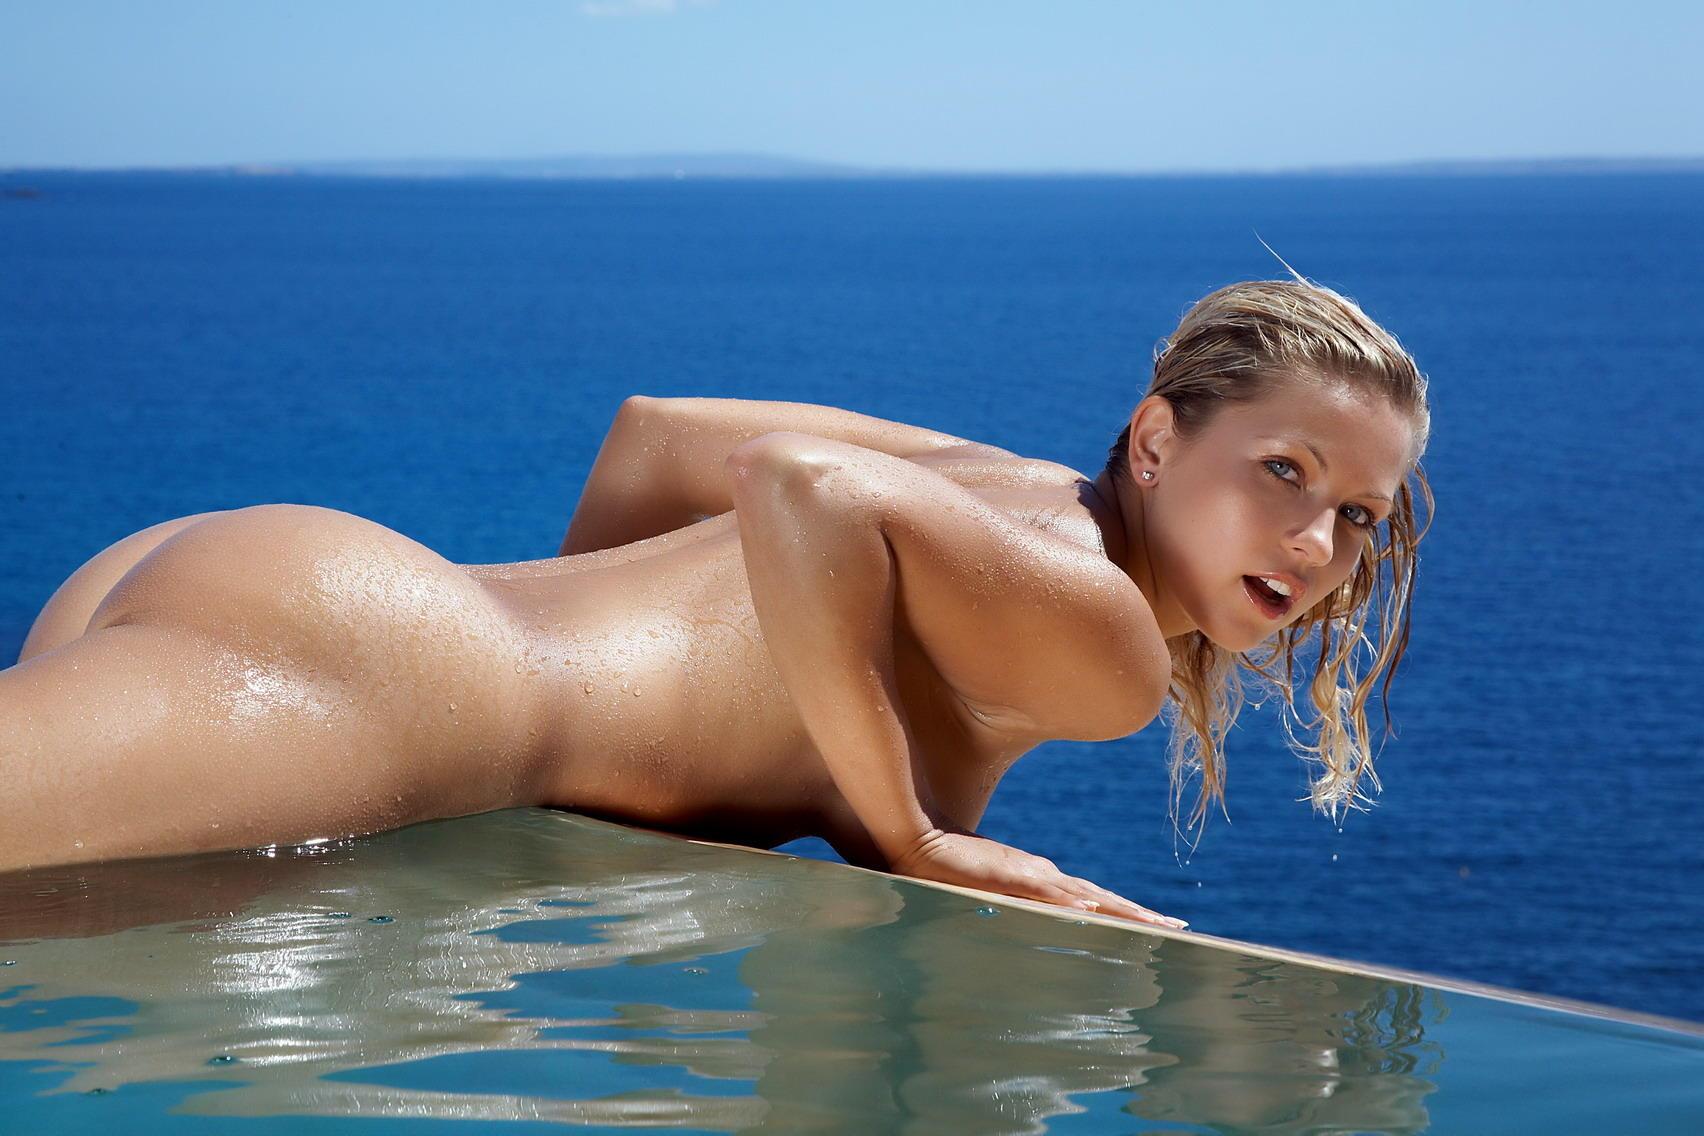 Jennifer o'dell nude